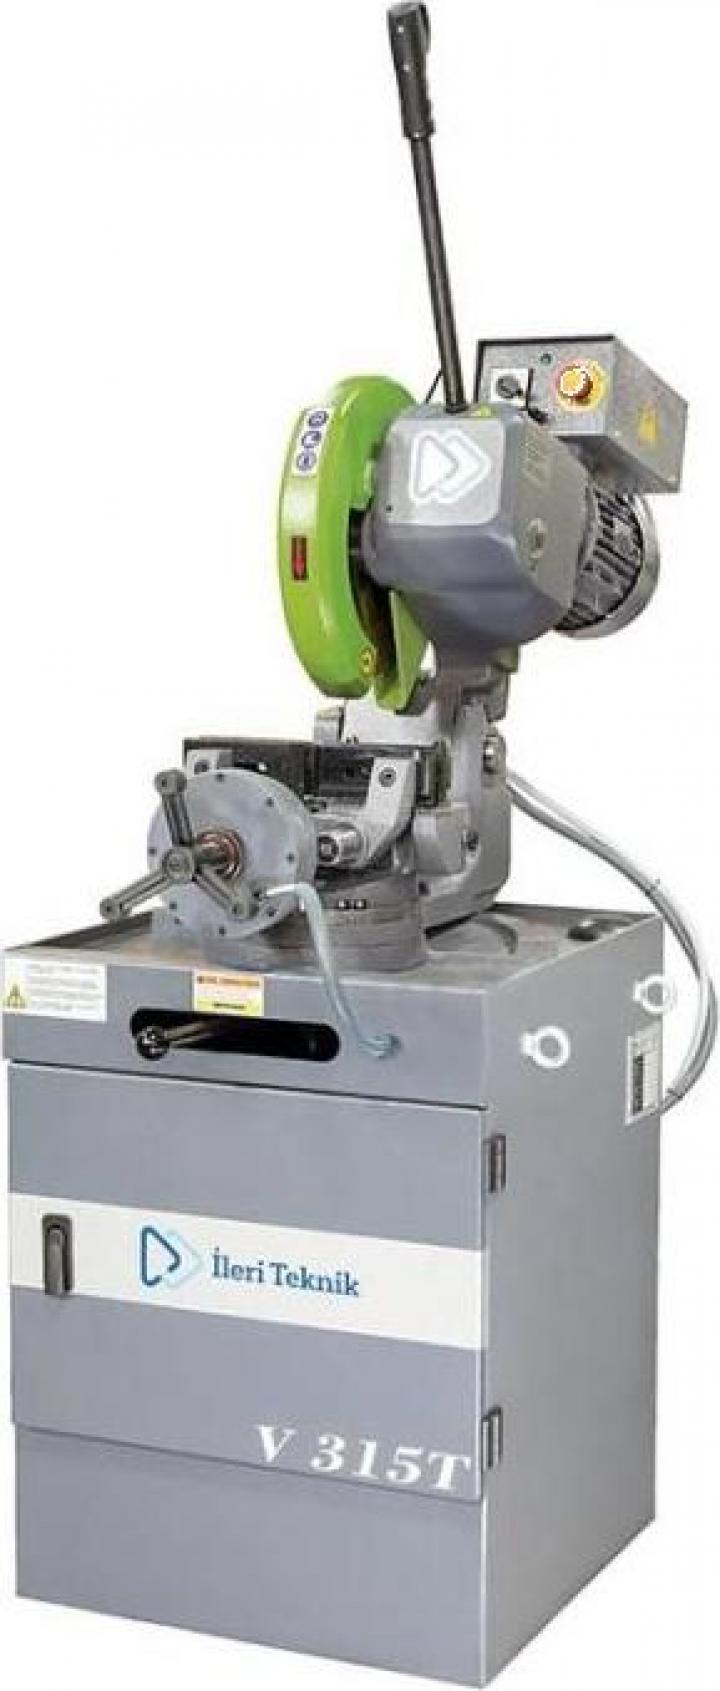 Fierastrau circular manual cu menghina automata V 275 T